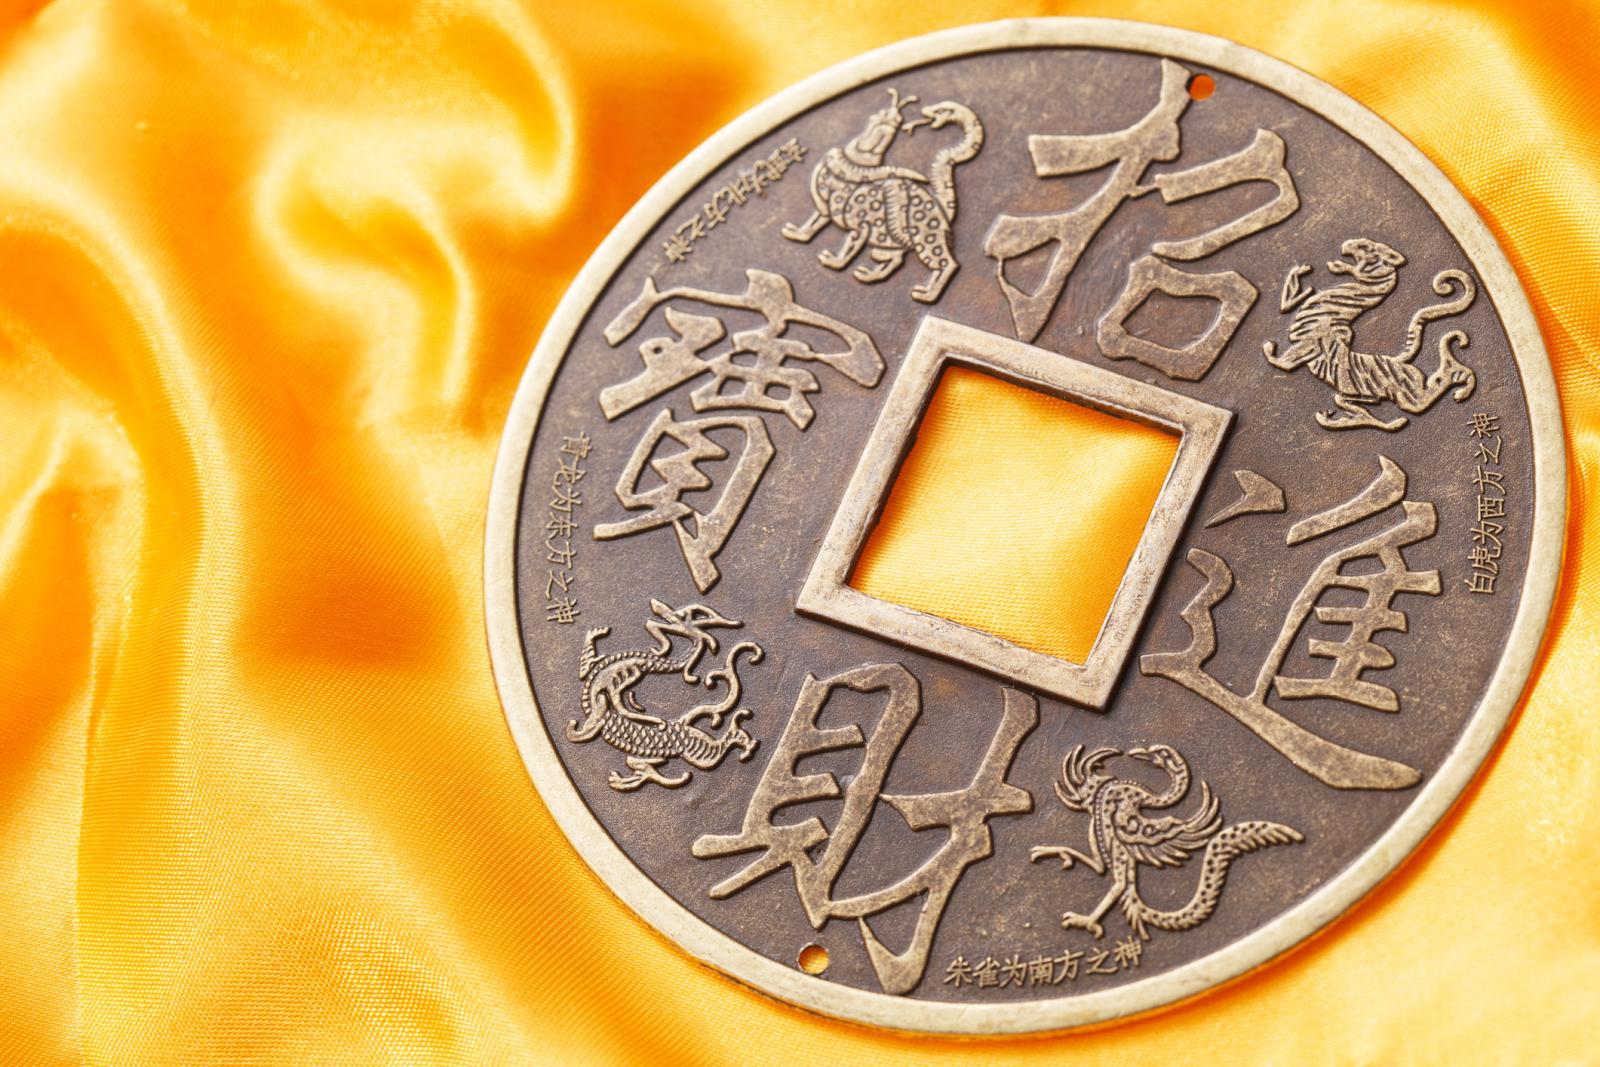 Moneda china en fondo amarillo